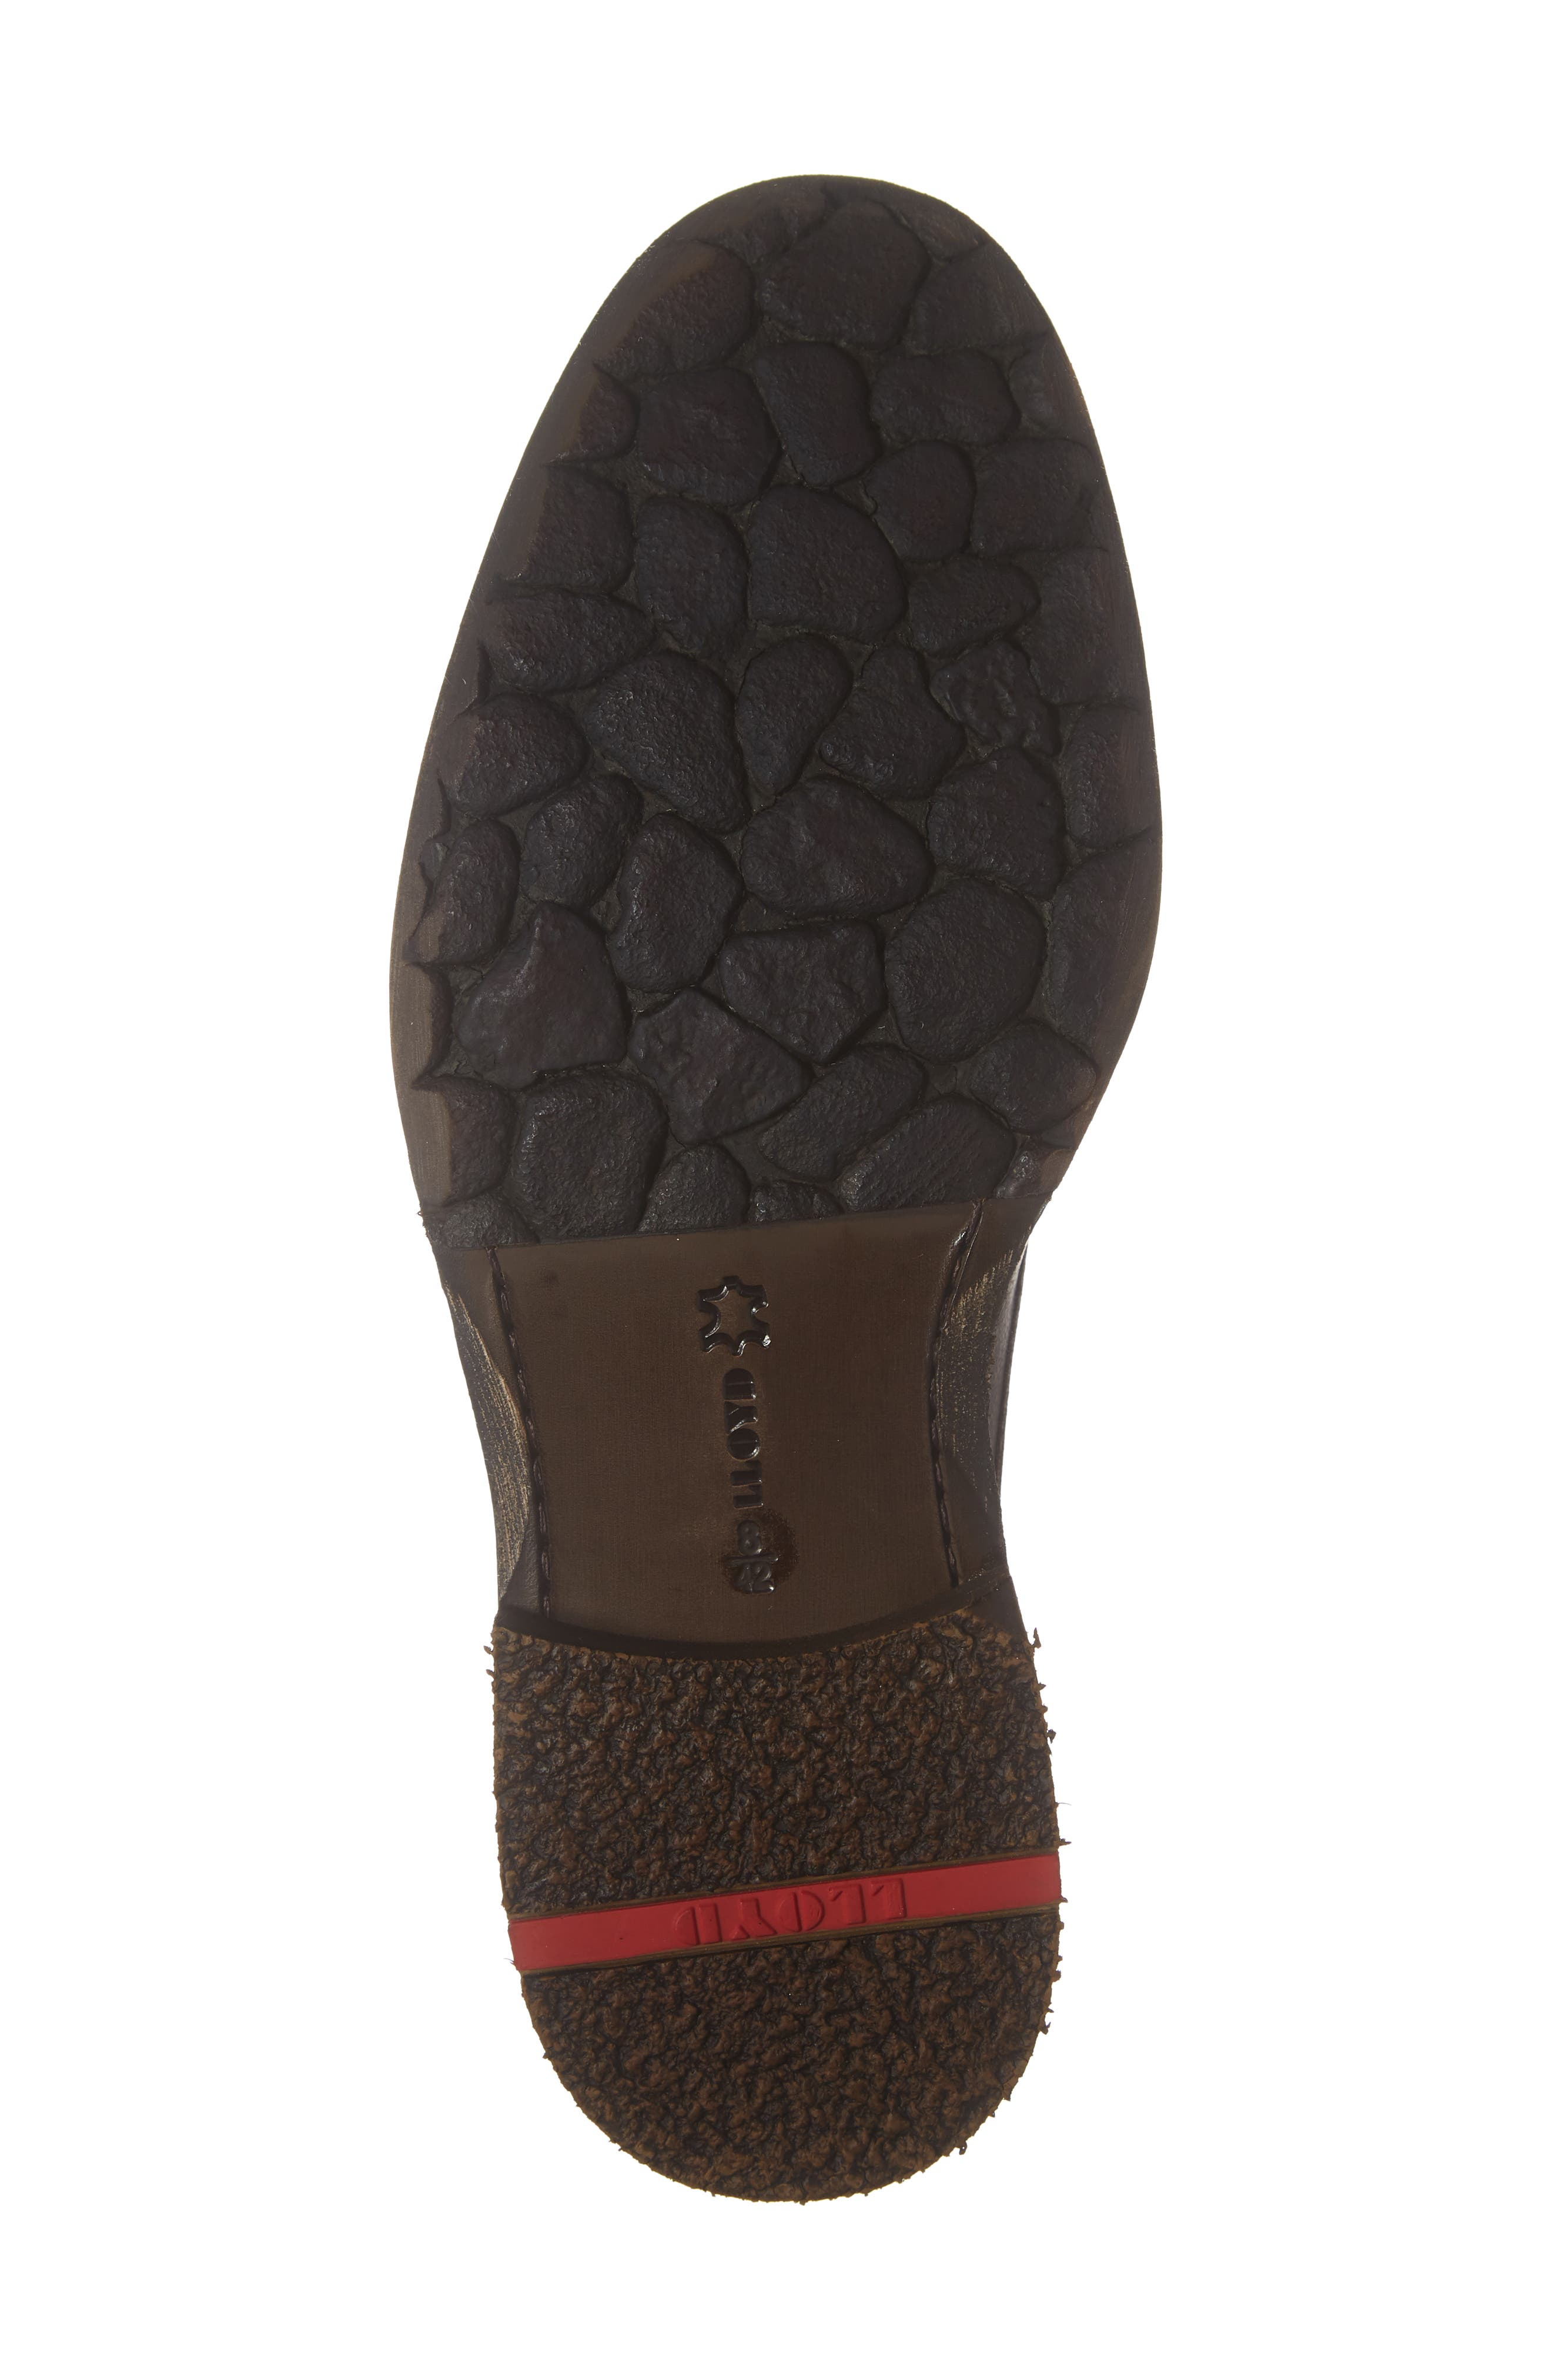 Dingo Plain Toe Boot,                             Alternate thumbnail 6, color,                             TOBACCO LEATHER